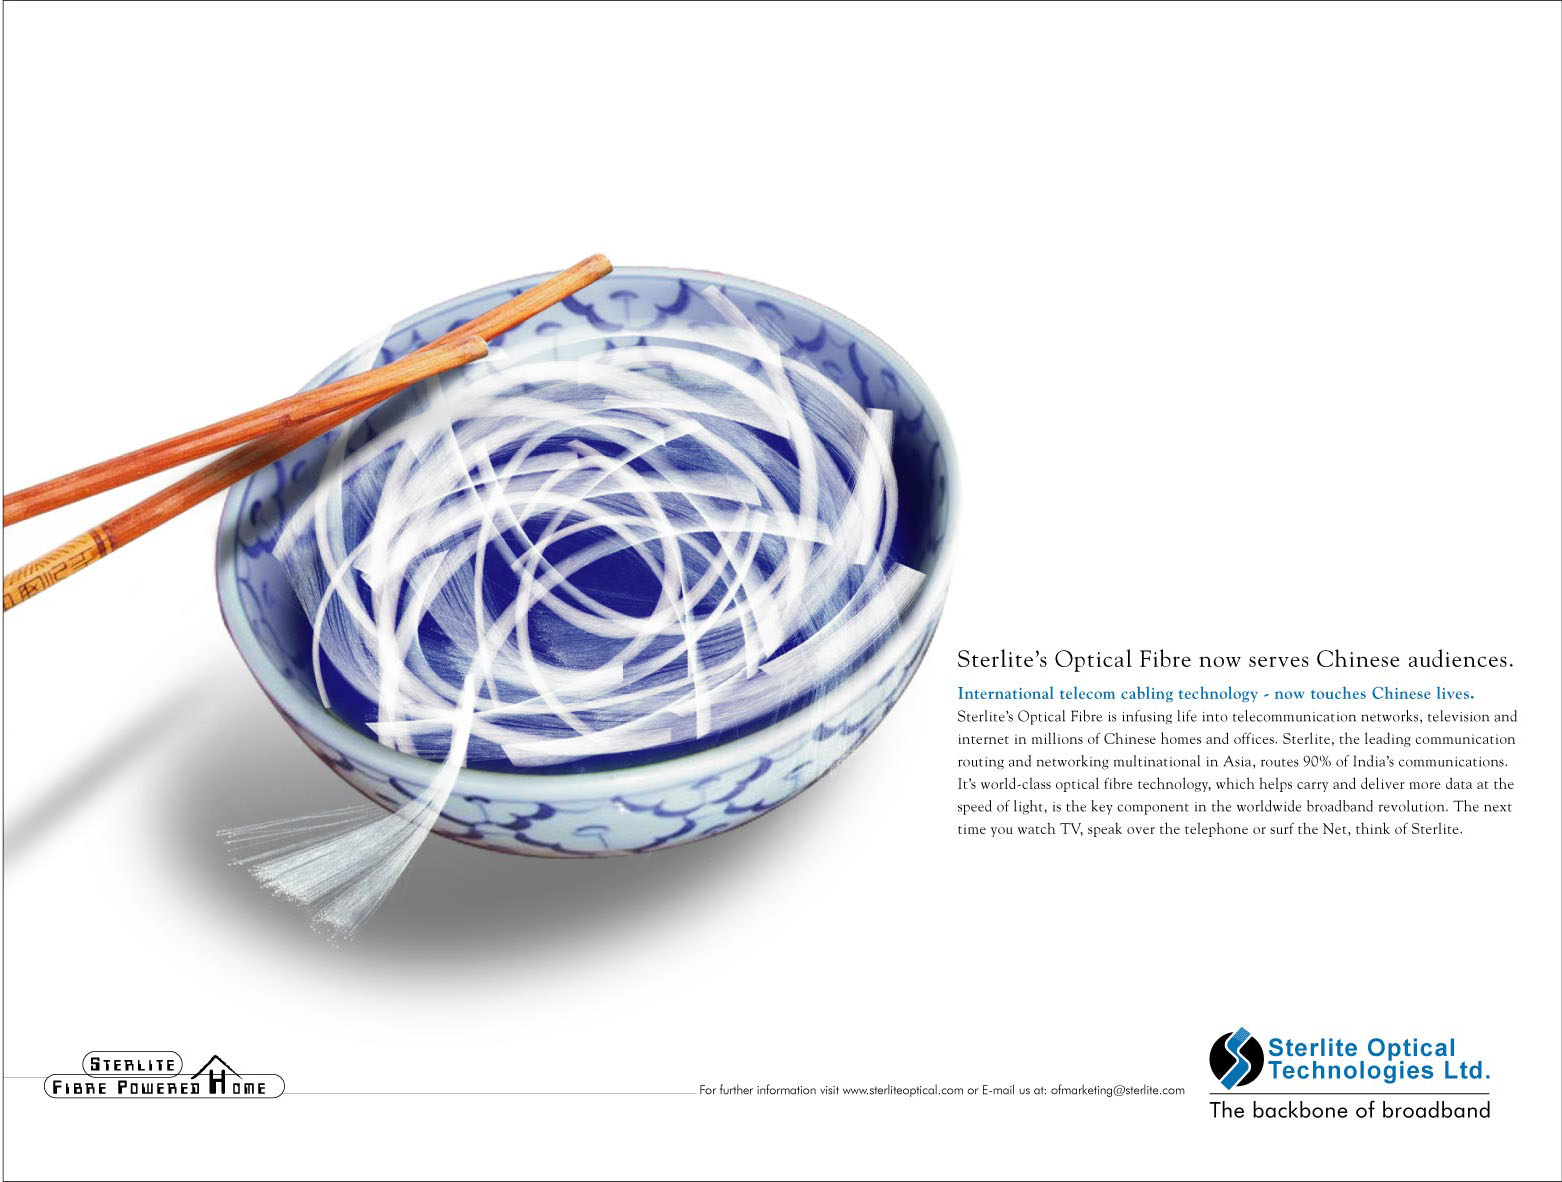 Sterlite optical fibre